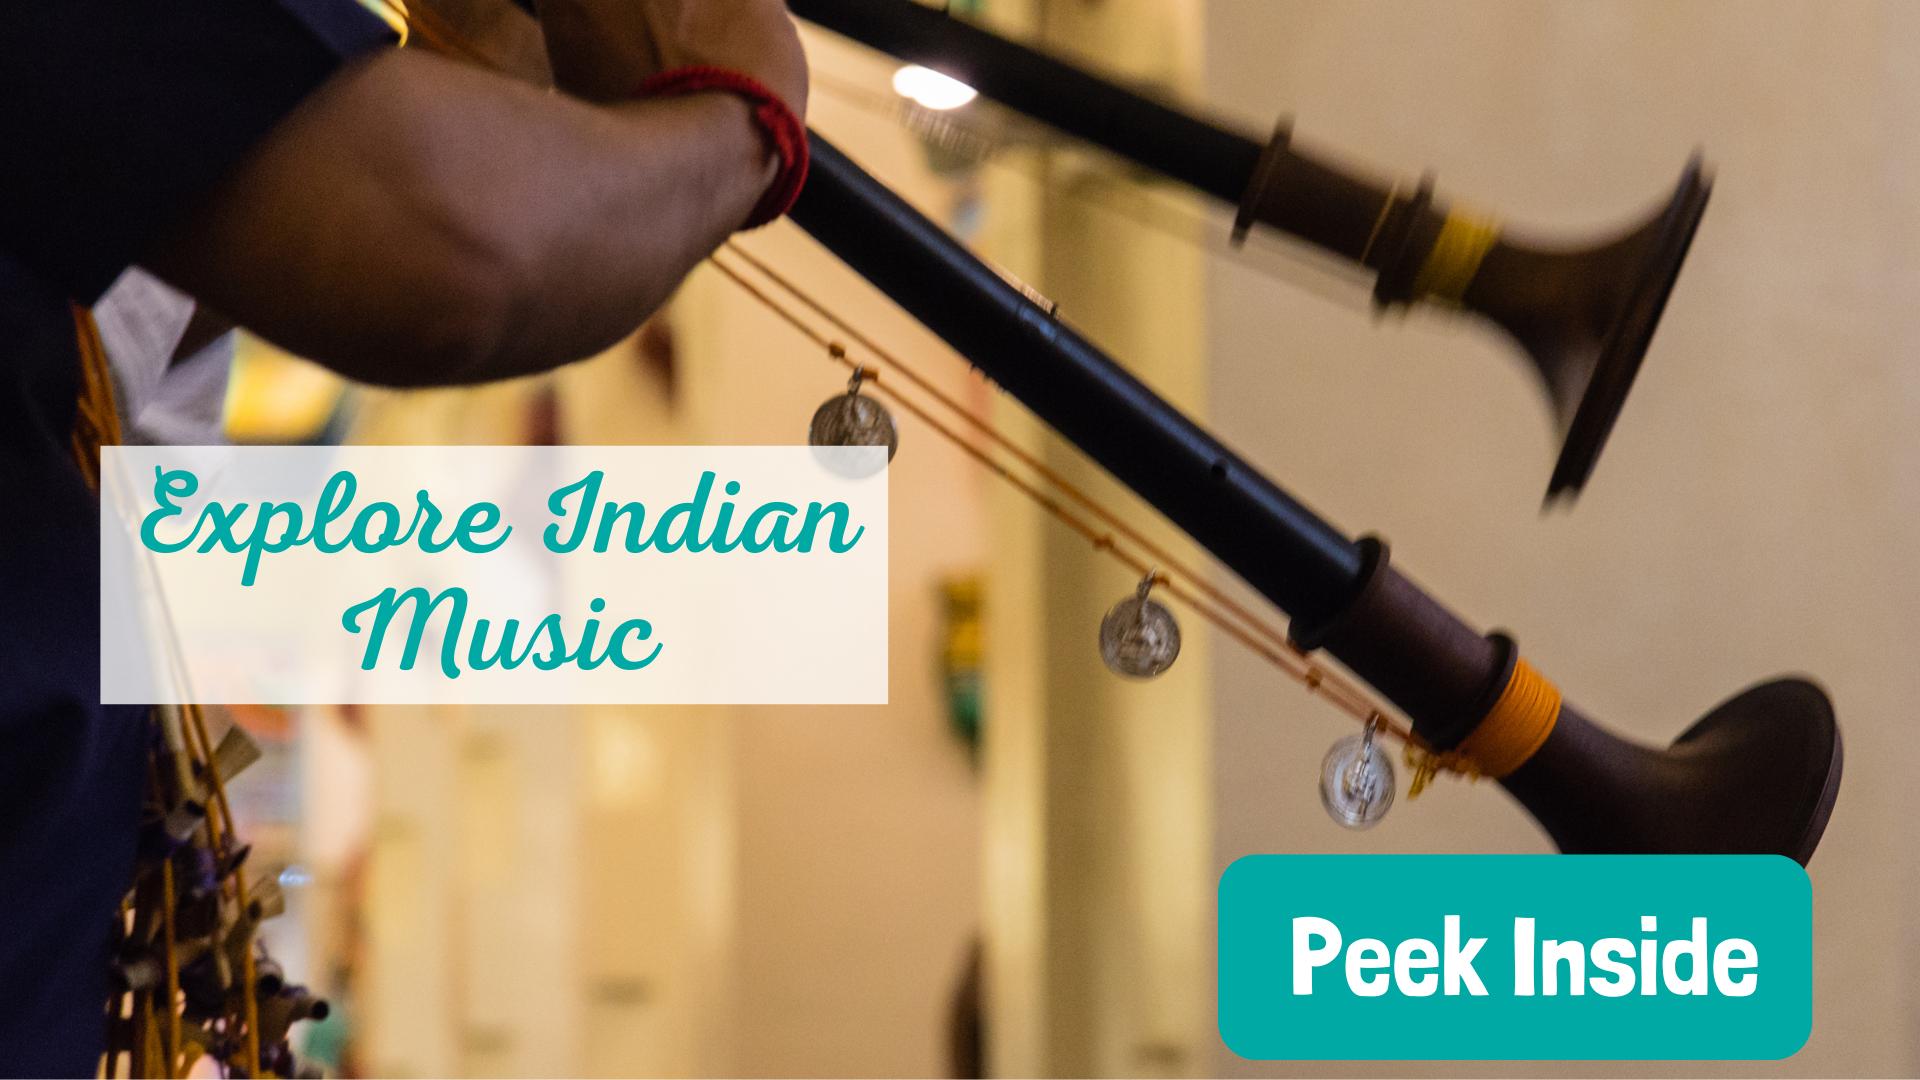 Explore Indian Music for preschoolers